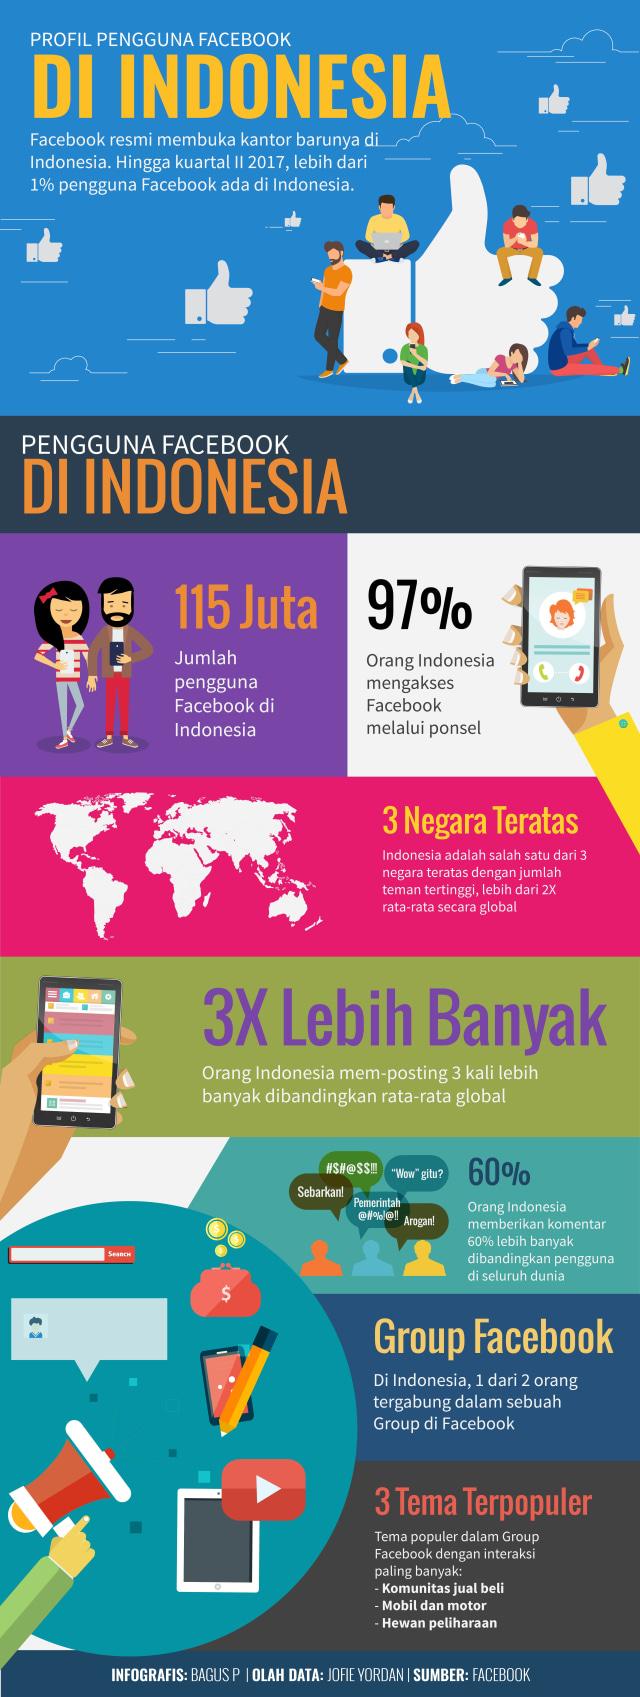 Infografis Profil Pengguna Facebook Indonesia